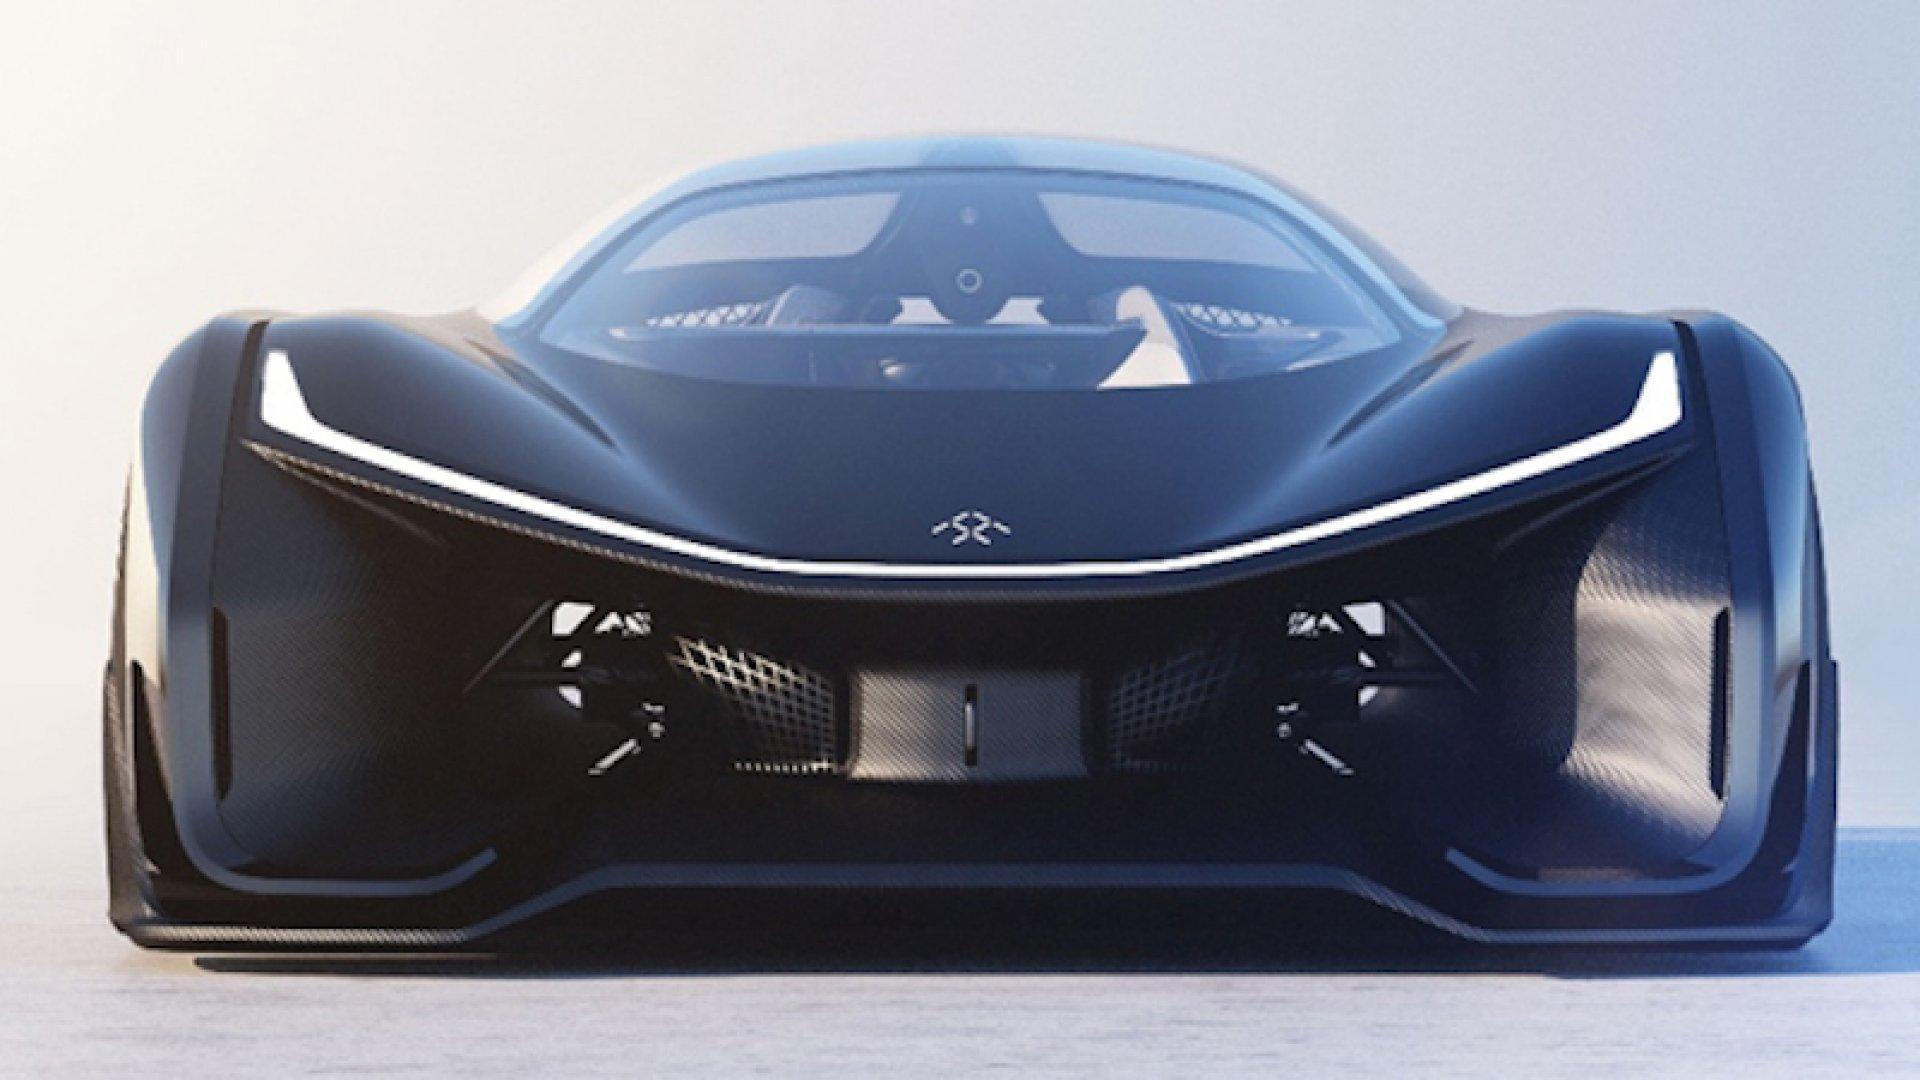 Faraday Future's concept car.